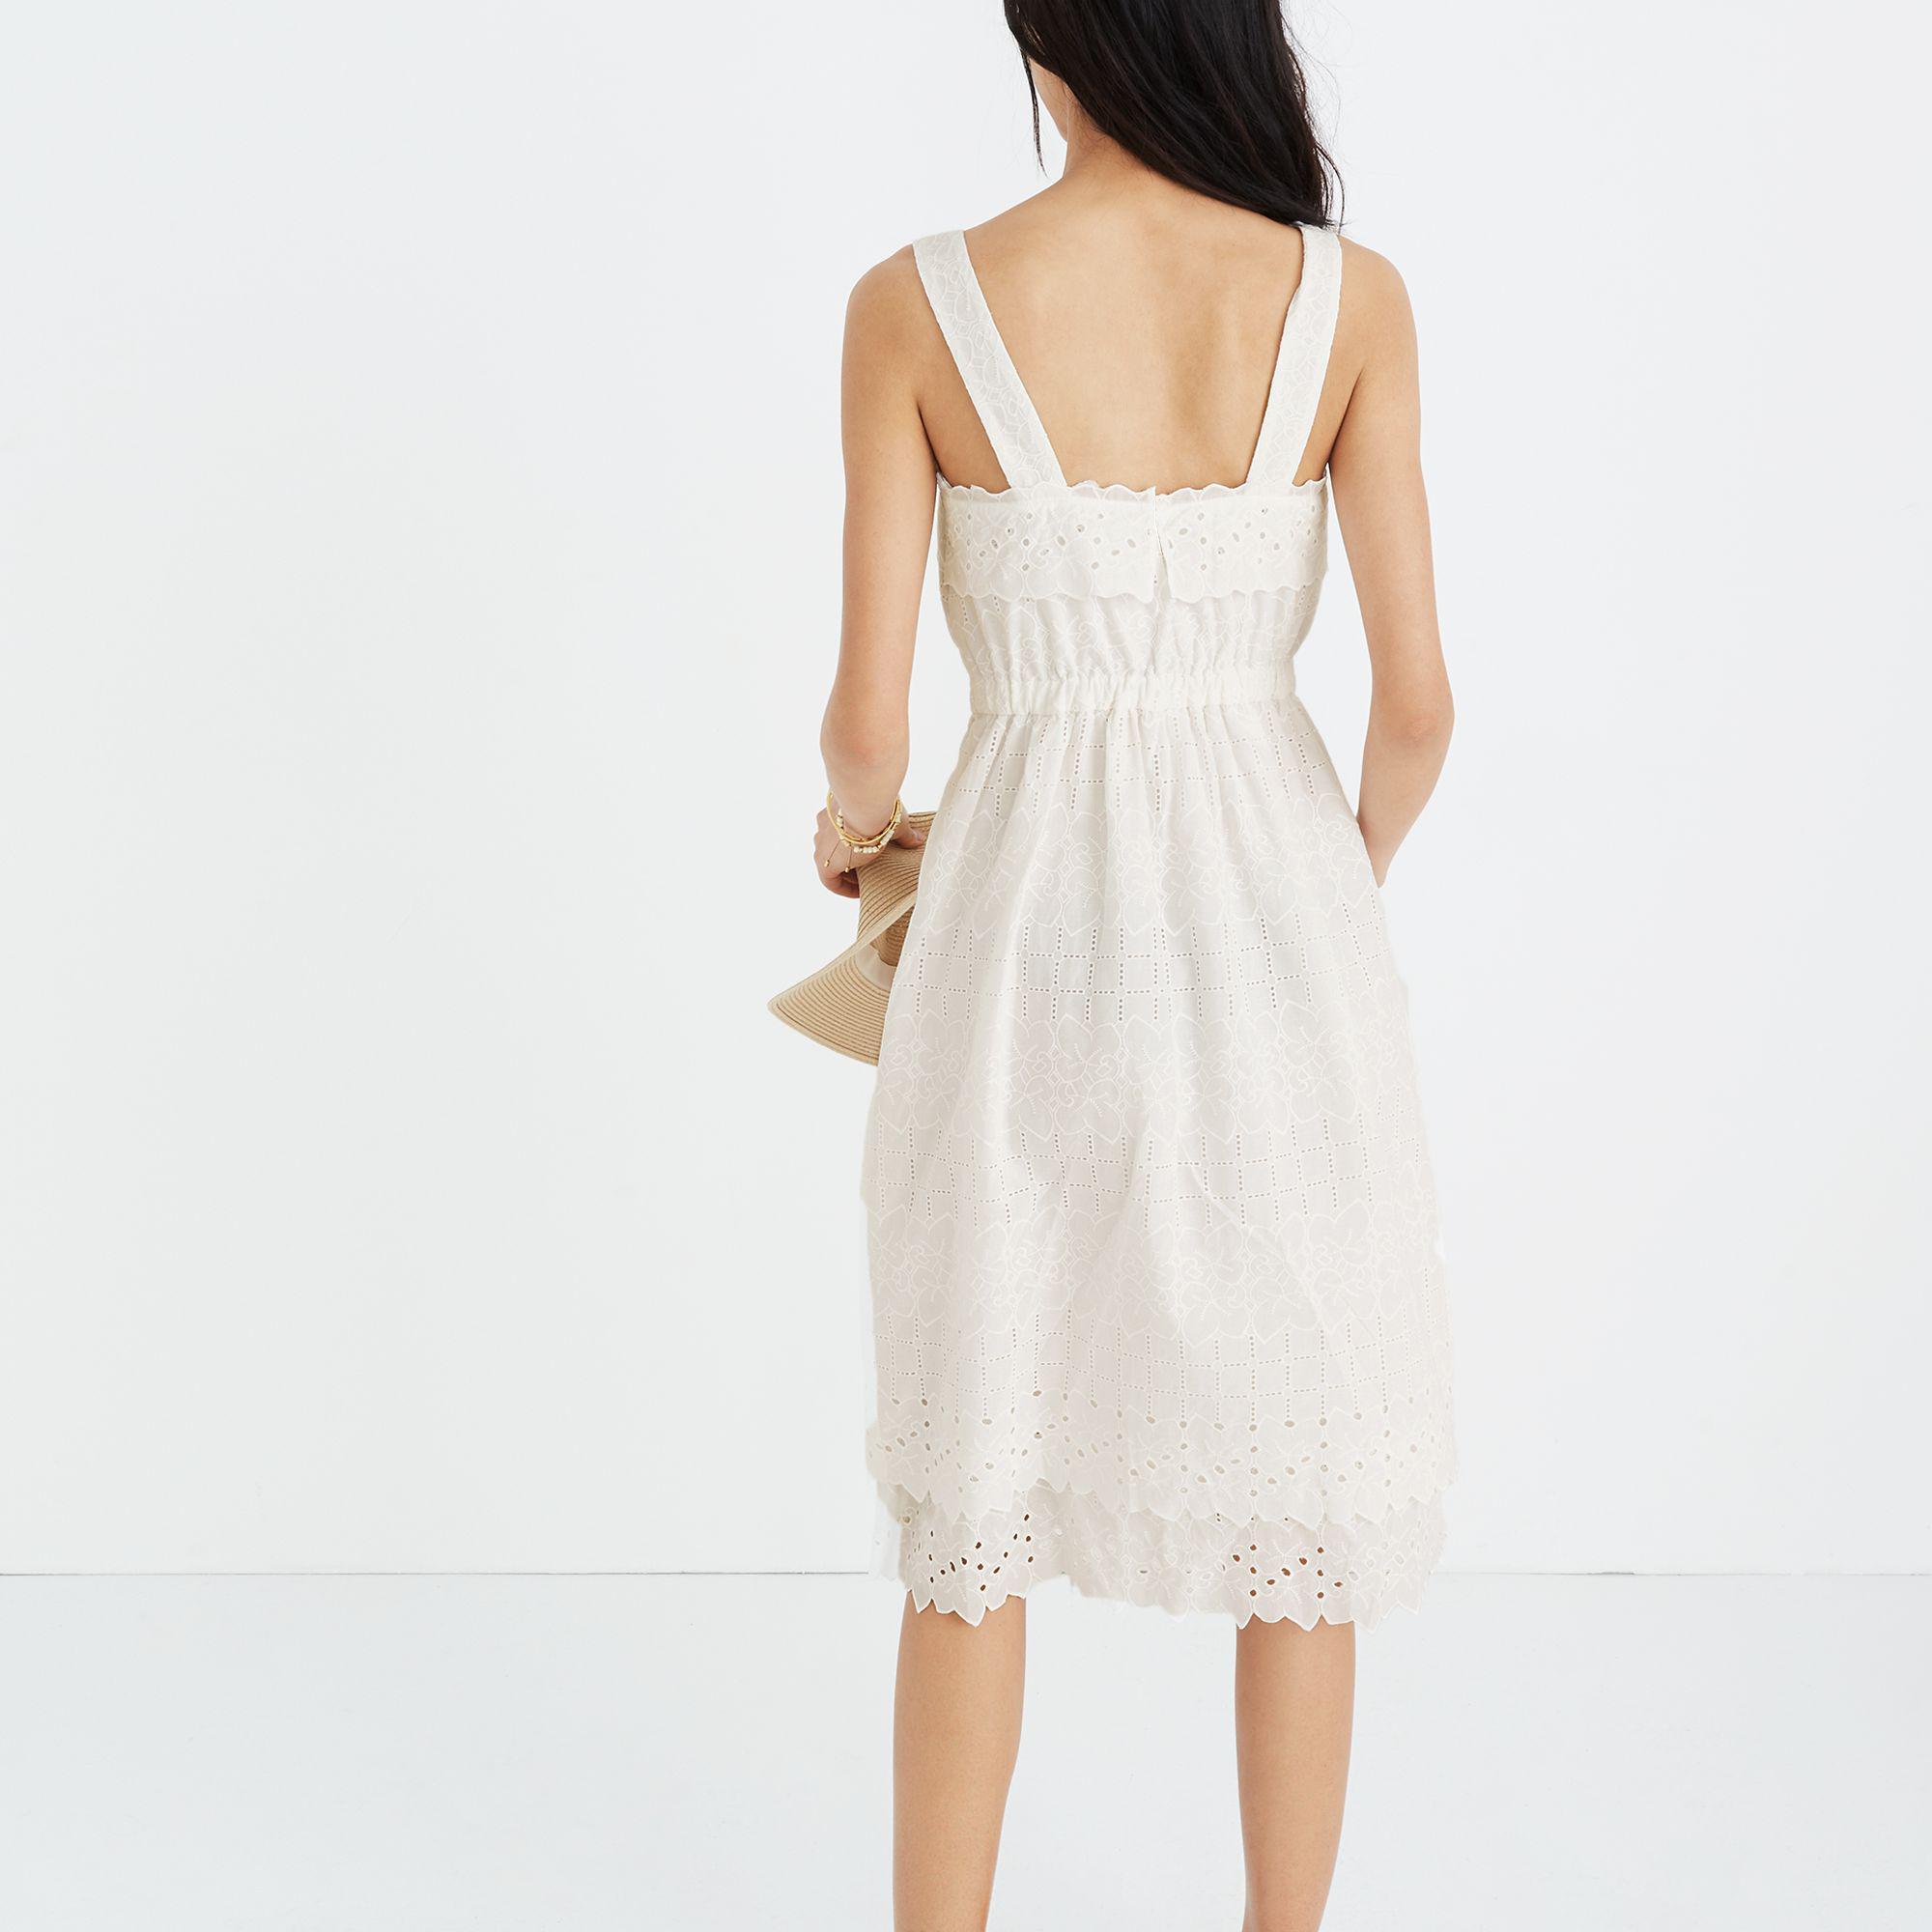 3612de01f40 Gallery. Women s Midi Dresses Women s Tiered Dresses